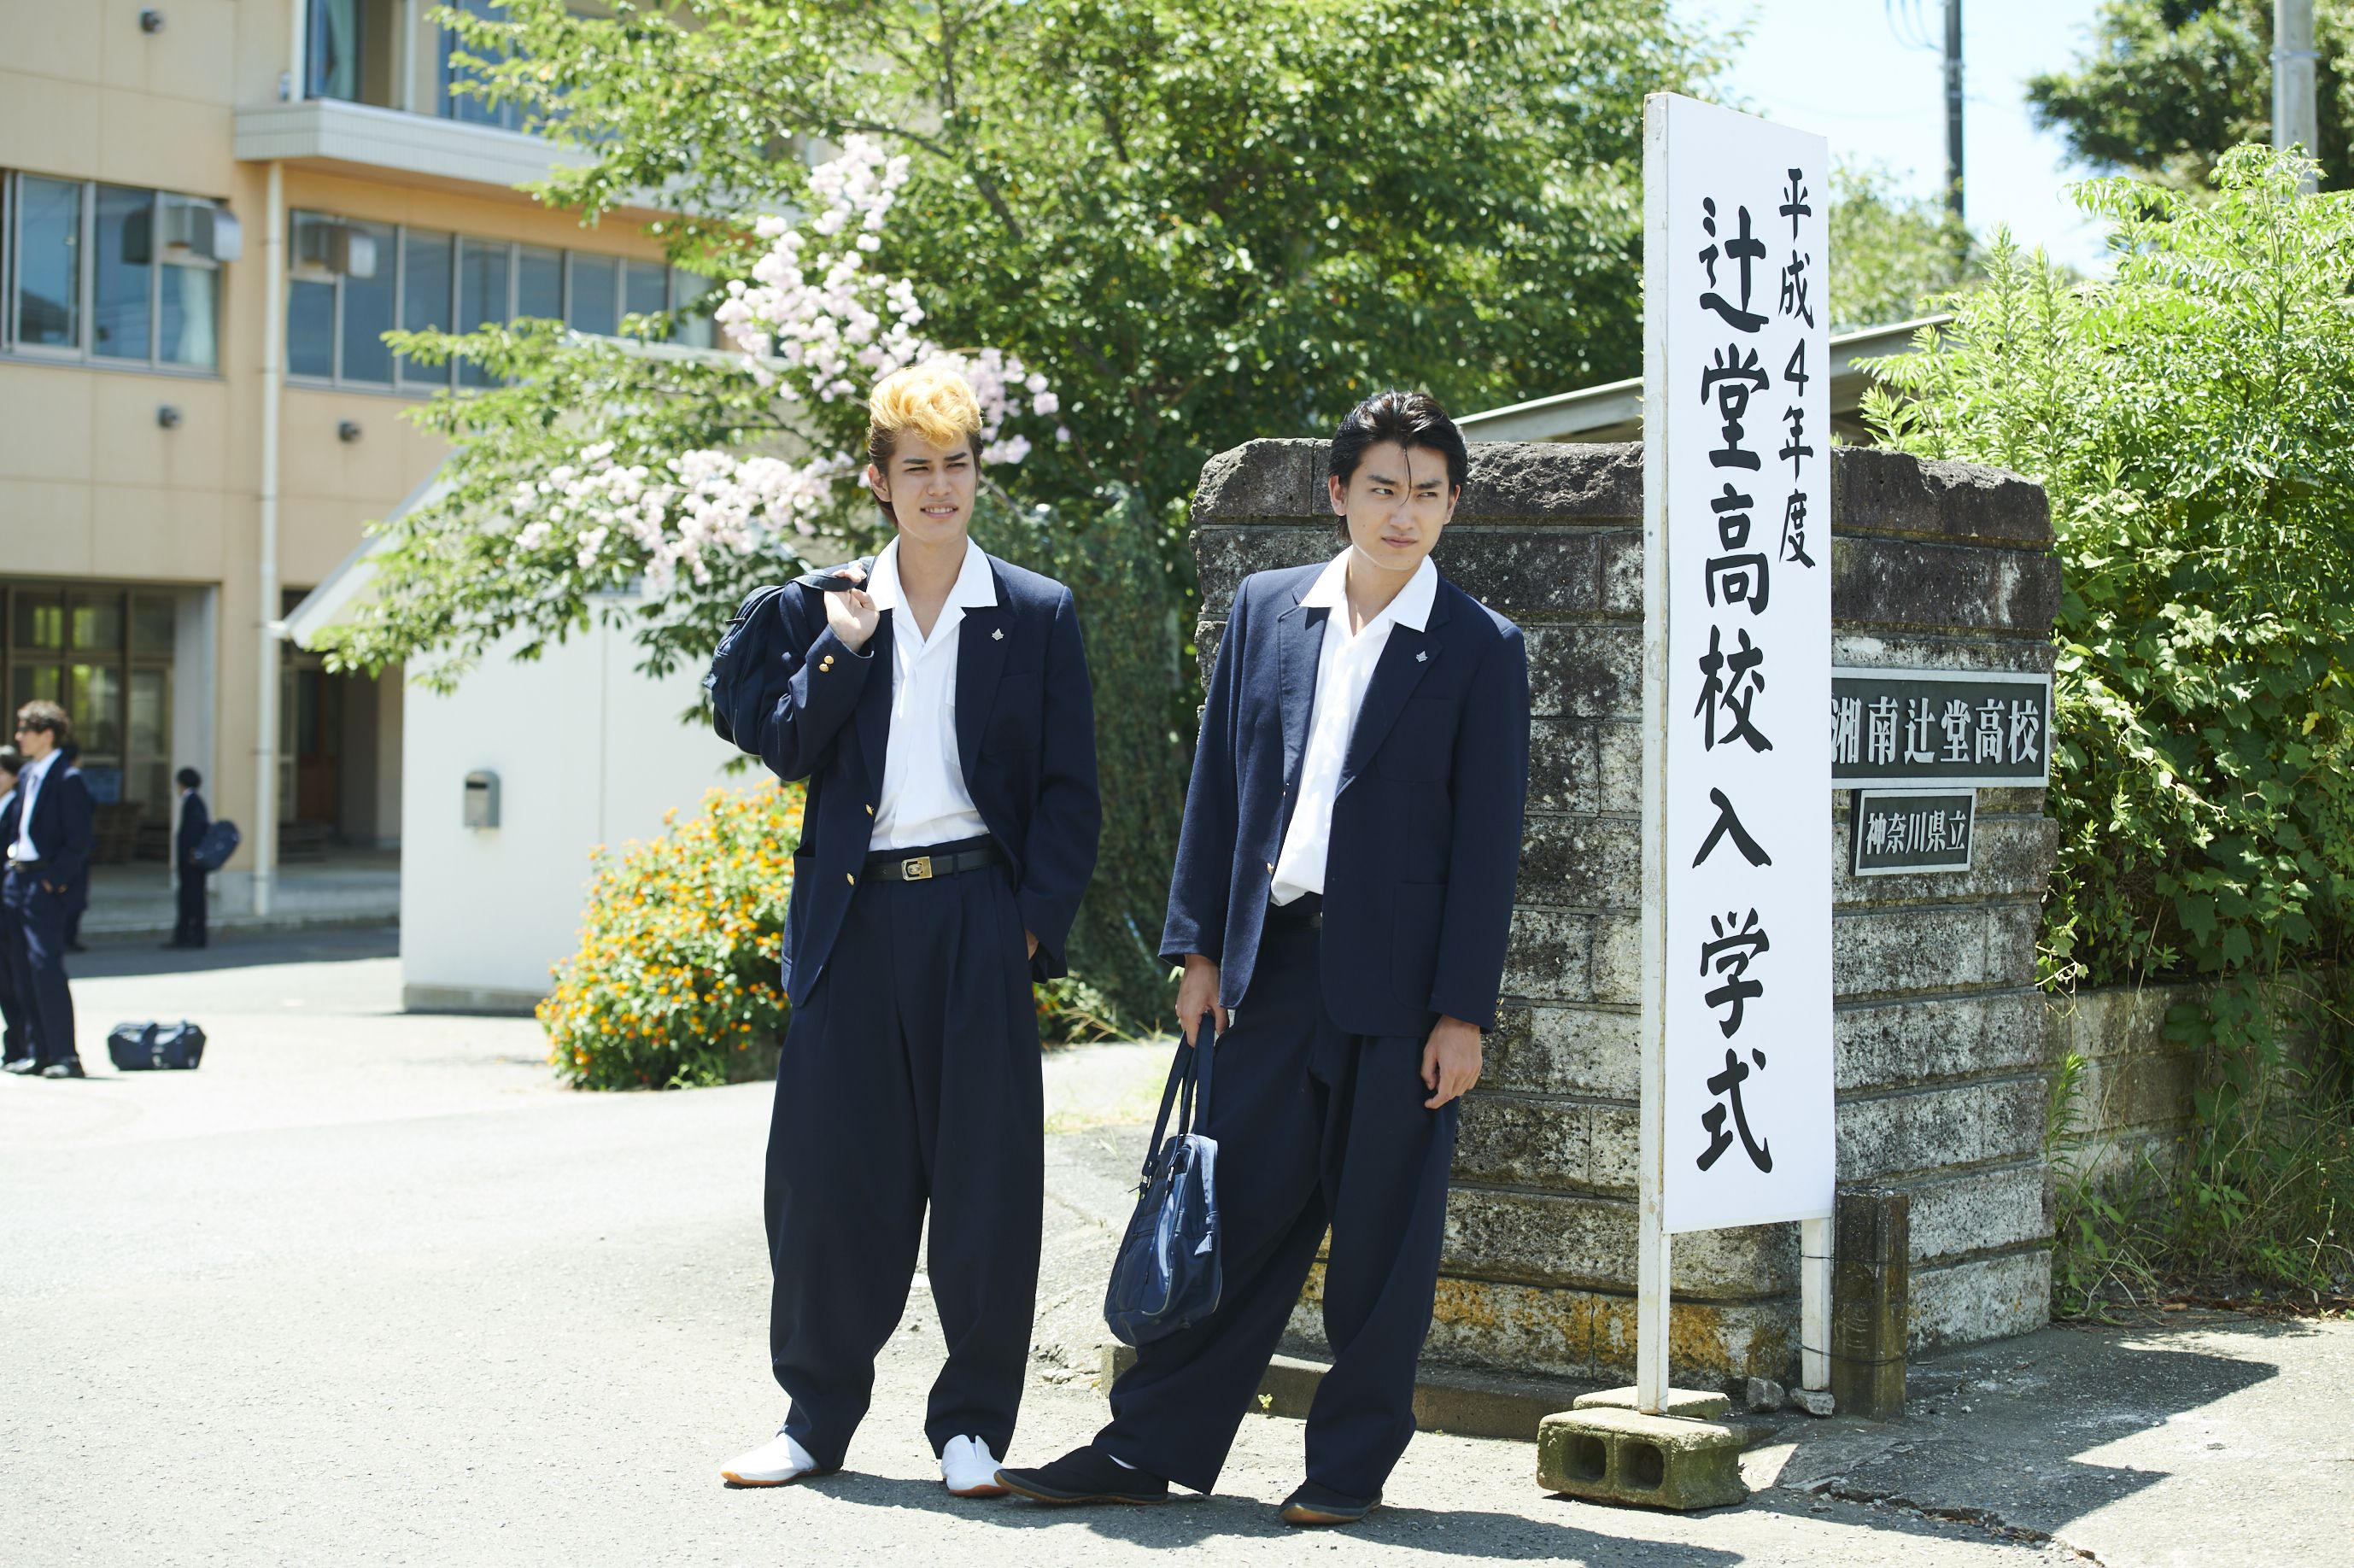 『GTO』の原点、ヤンキー漫画『湘南純愛組!』が寛一郎&金子大地で実写化決定の画像002